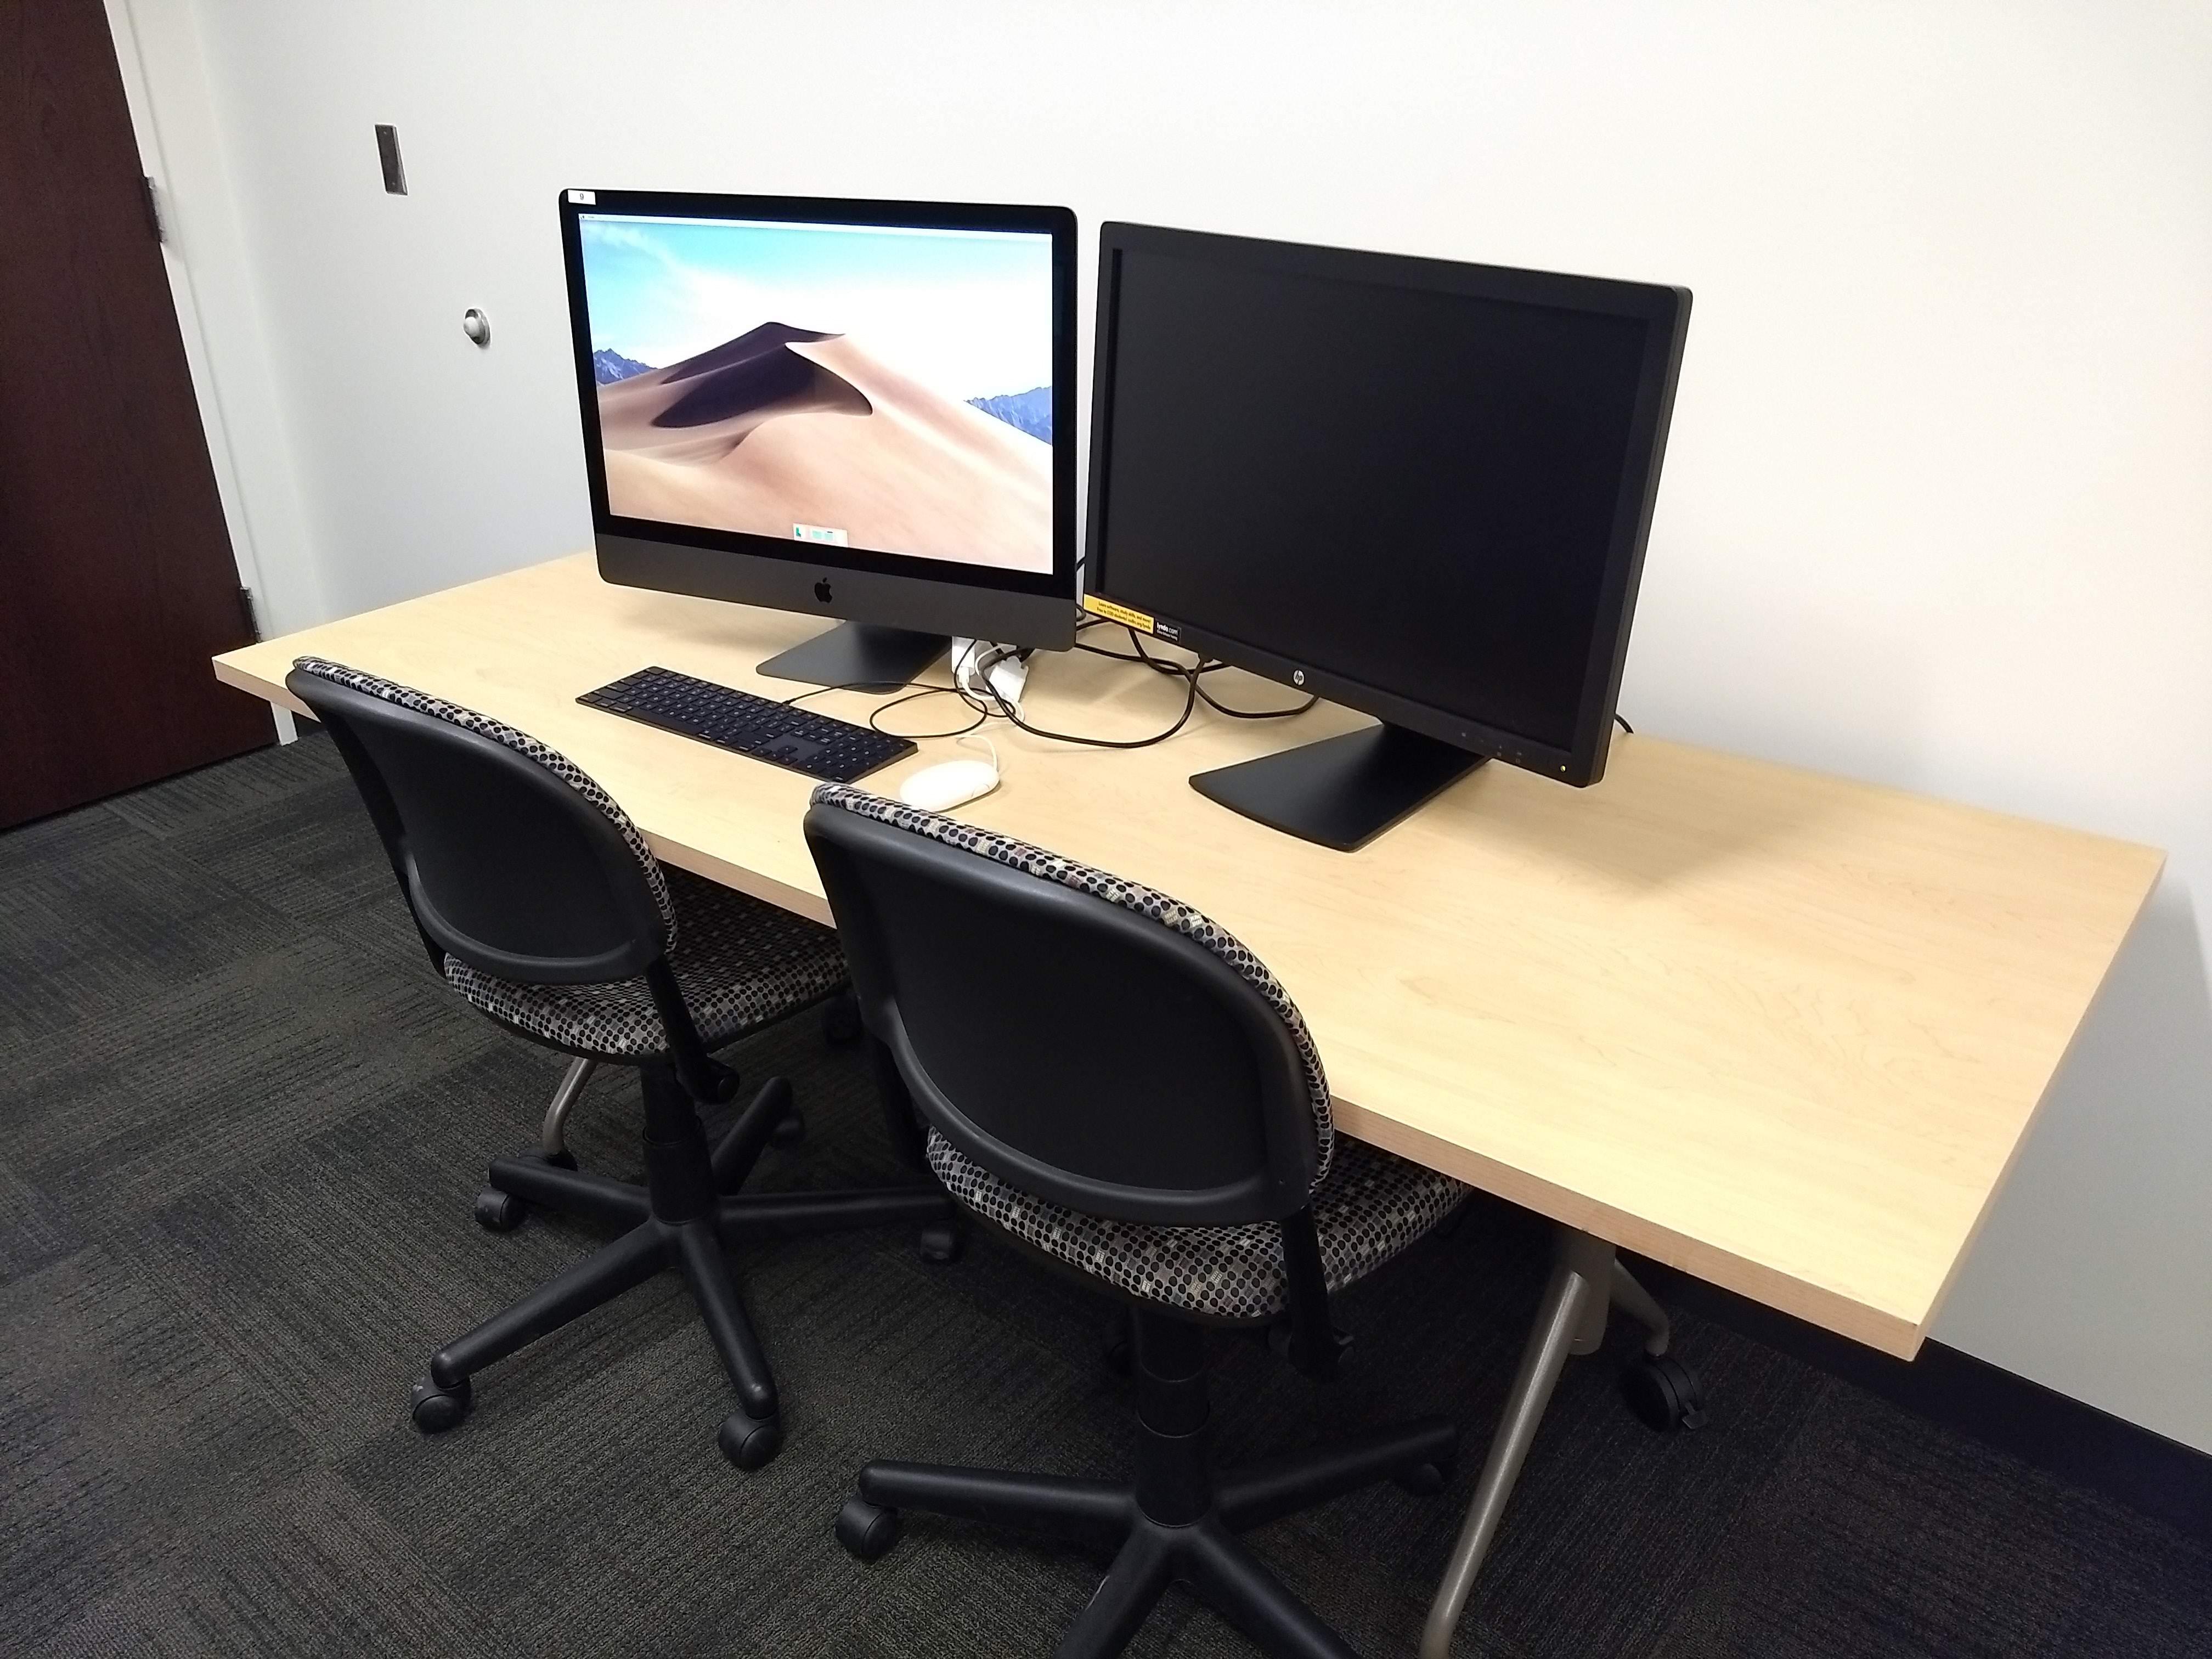 09 Workstation - Dual Monitor